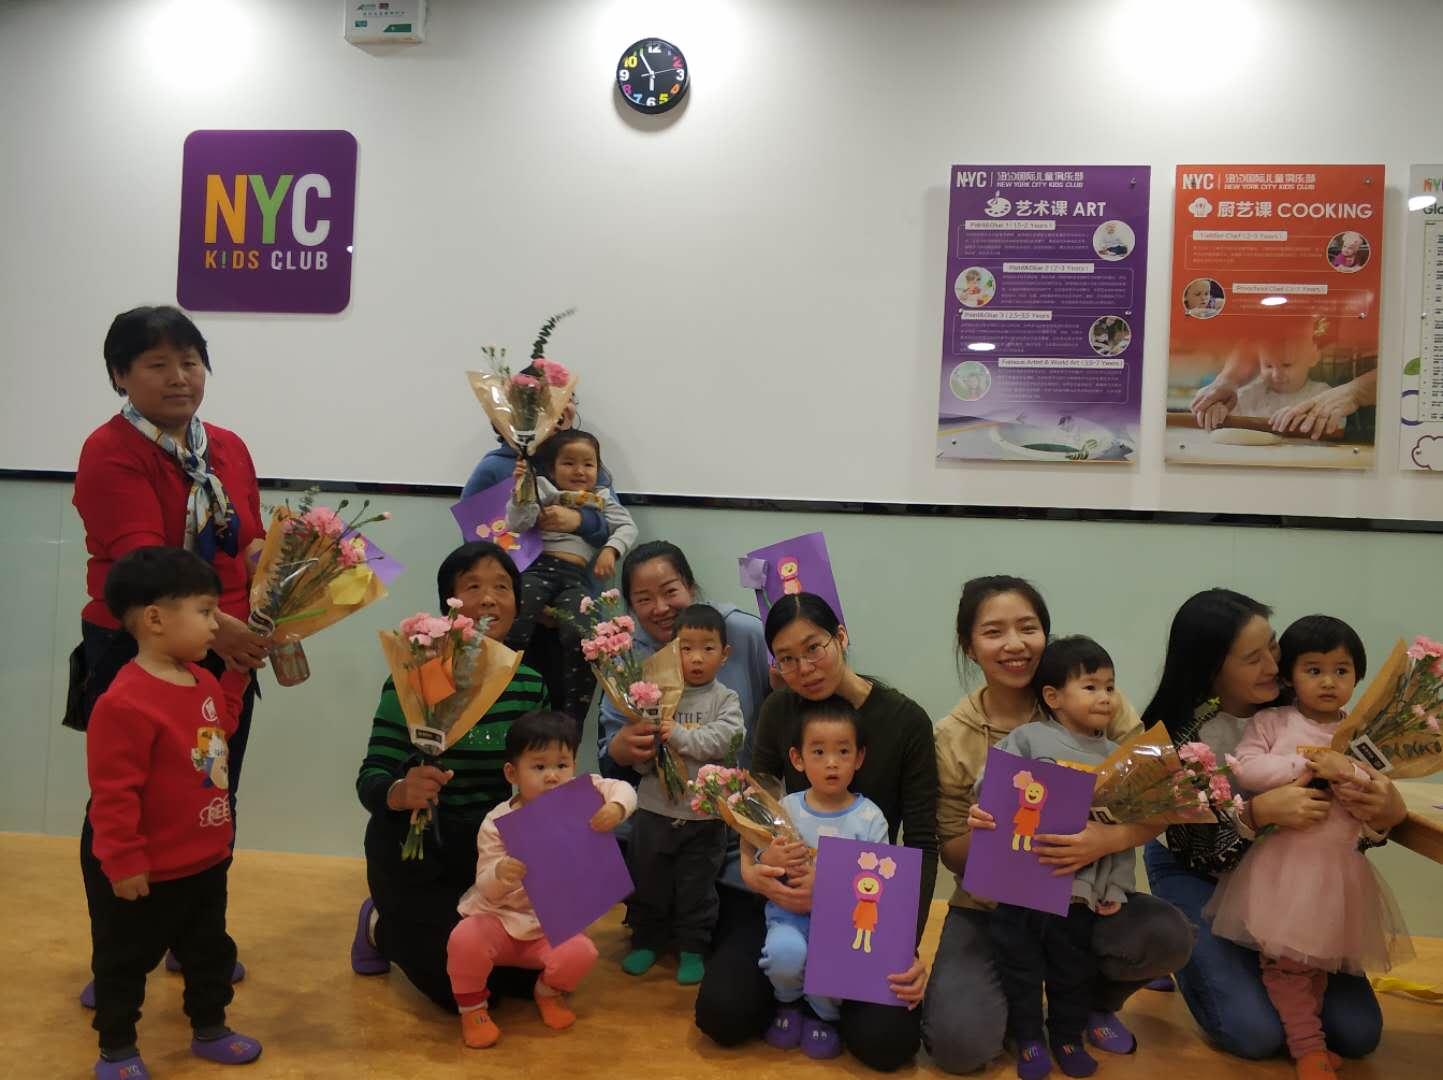 NYC纽约国际北京平谷早教中心:NYC女神节活动回顾